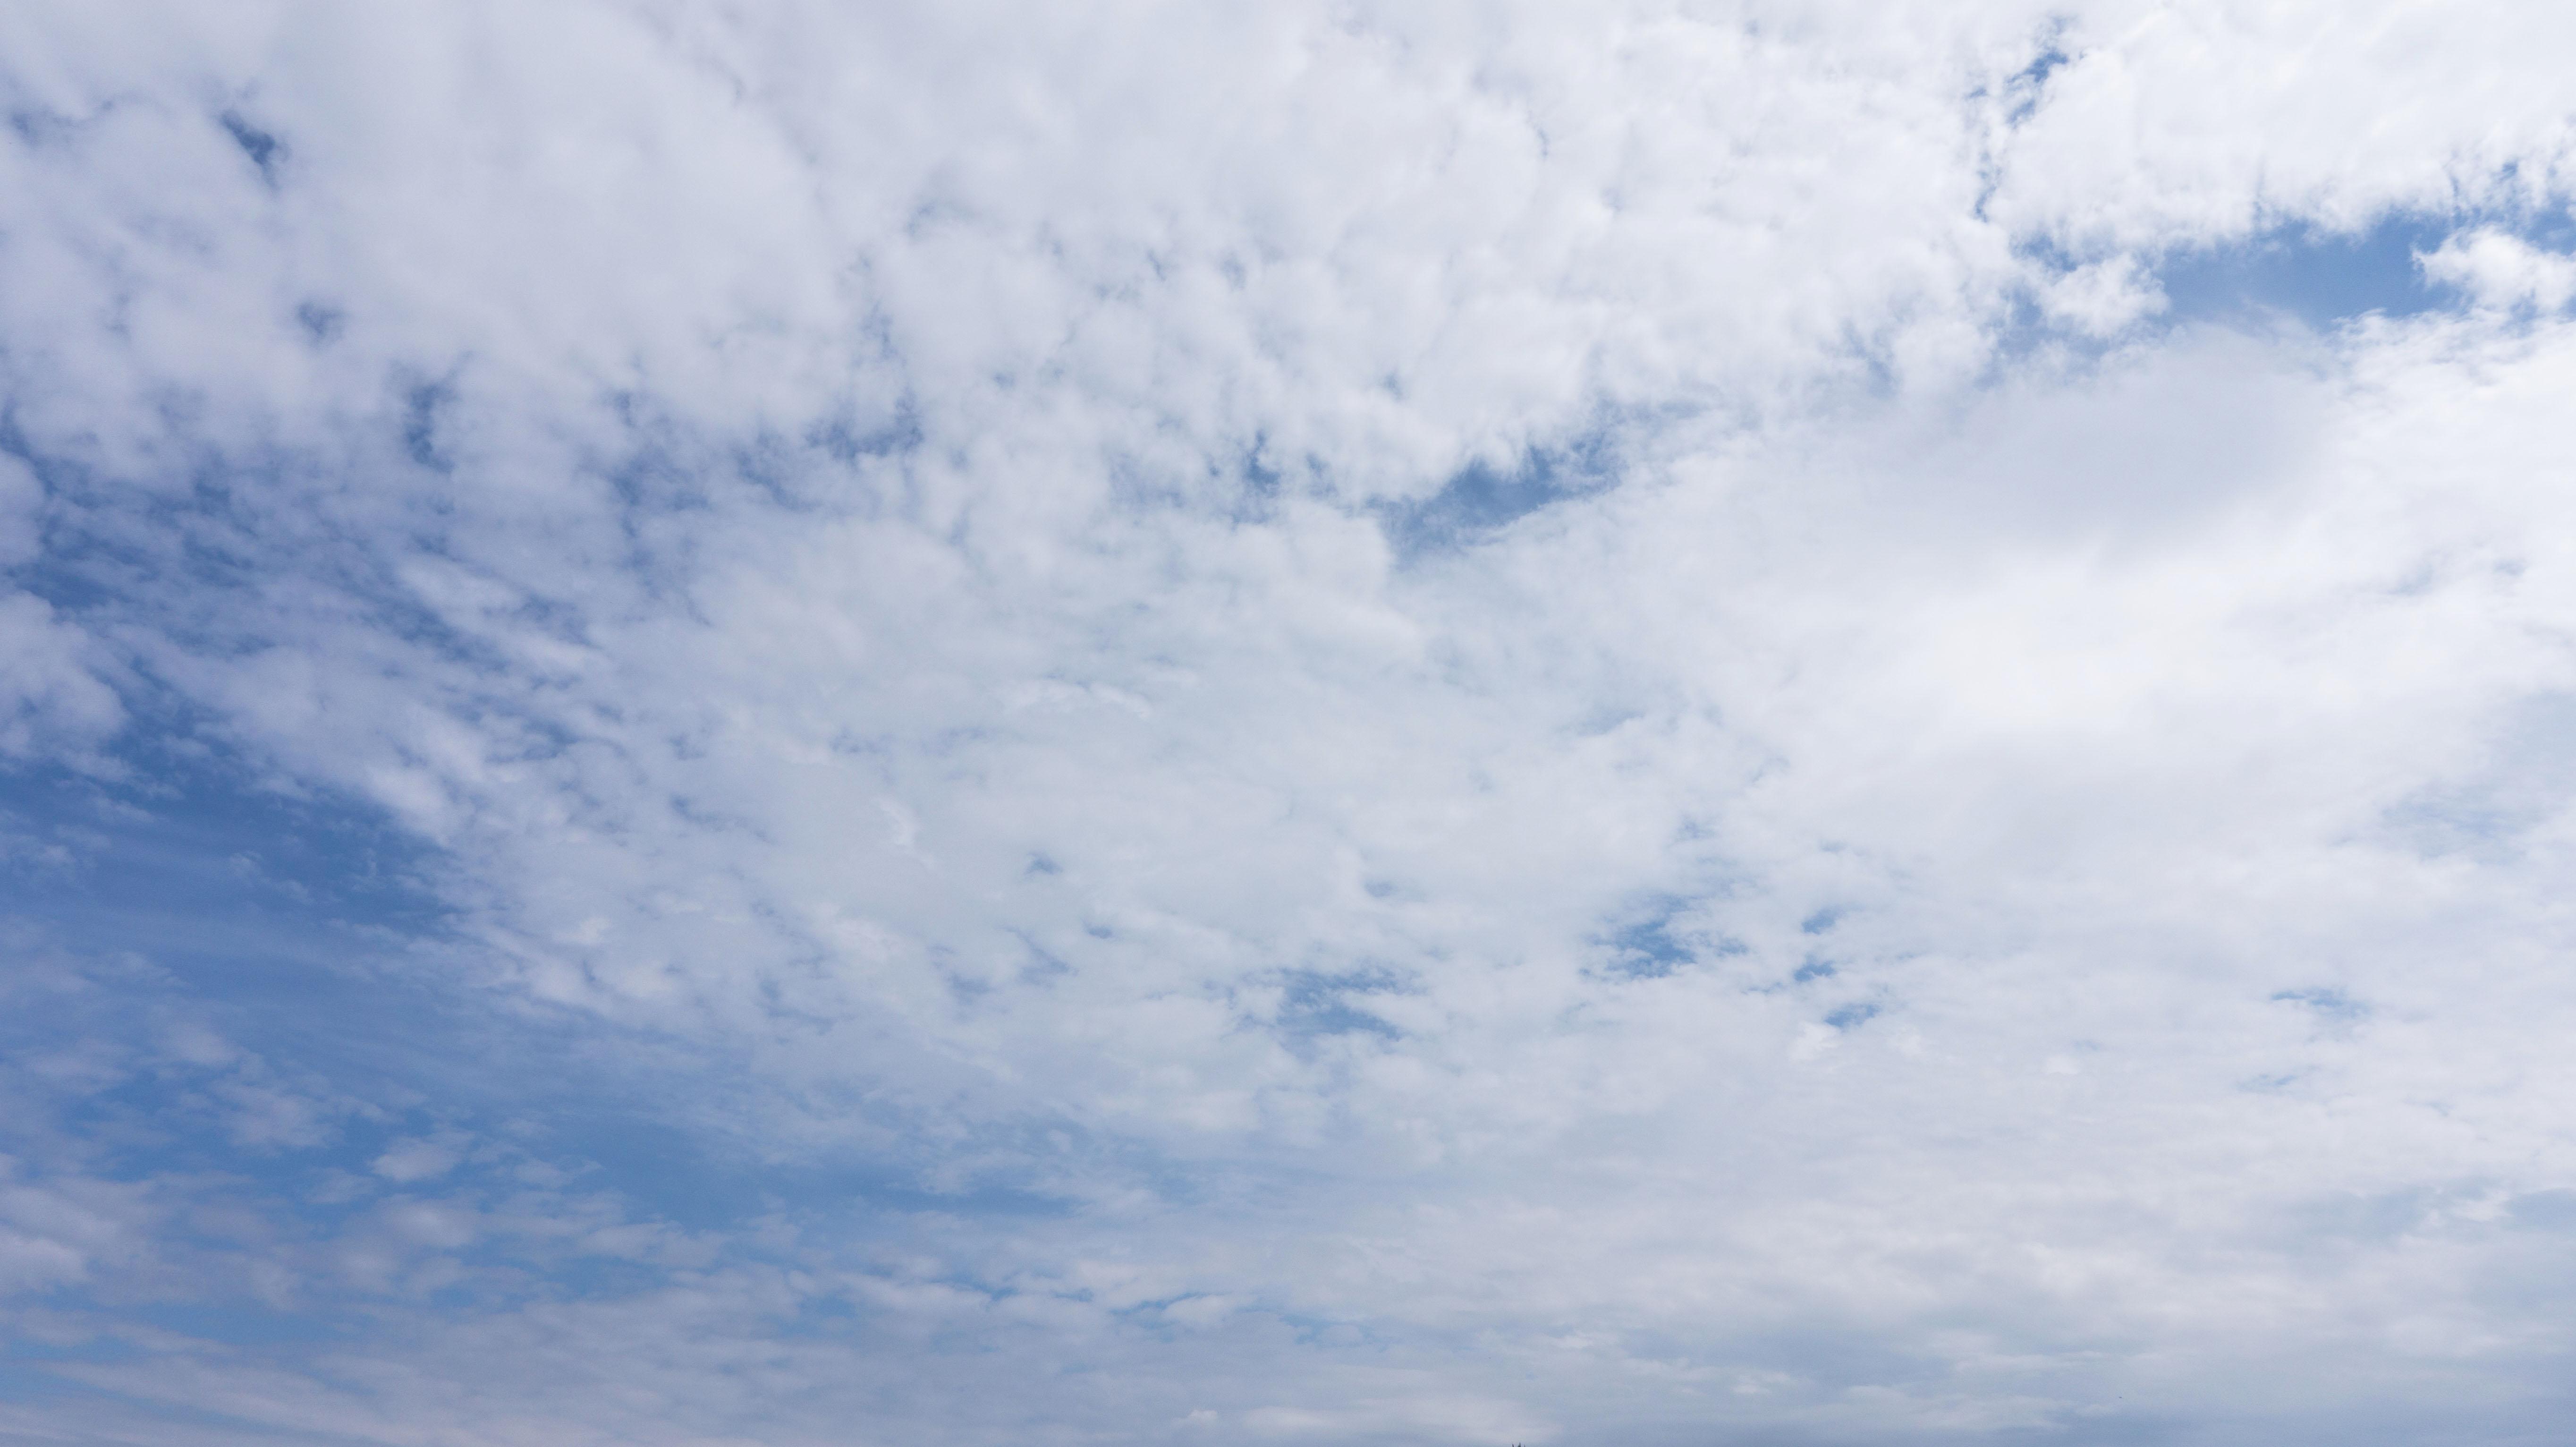 Hdri sky 015 hdri skies sky background 3 altavistaventures Images